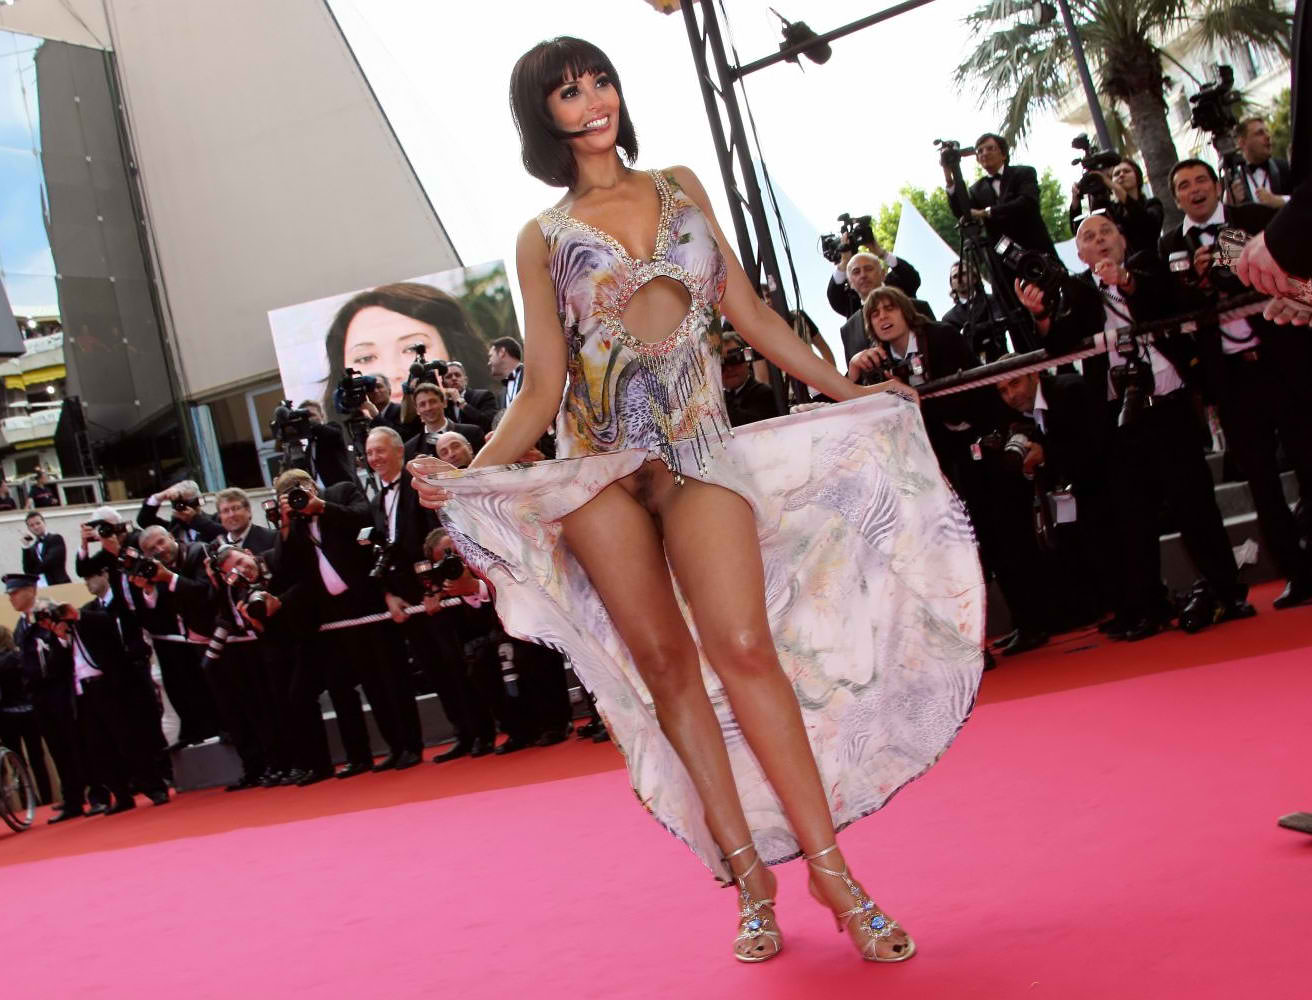 Yasmine Latiffe Pussy Slip (3 Photos)